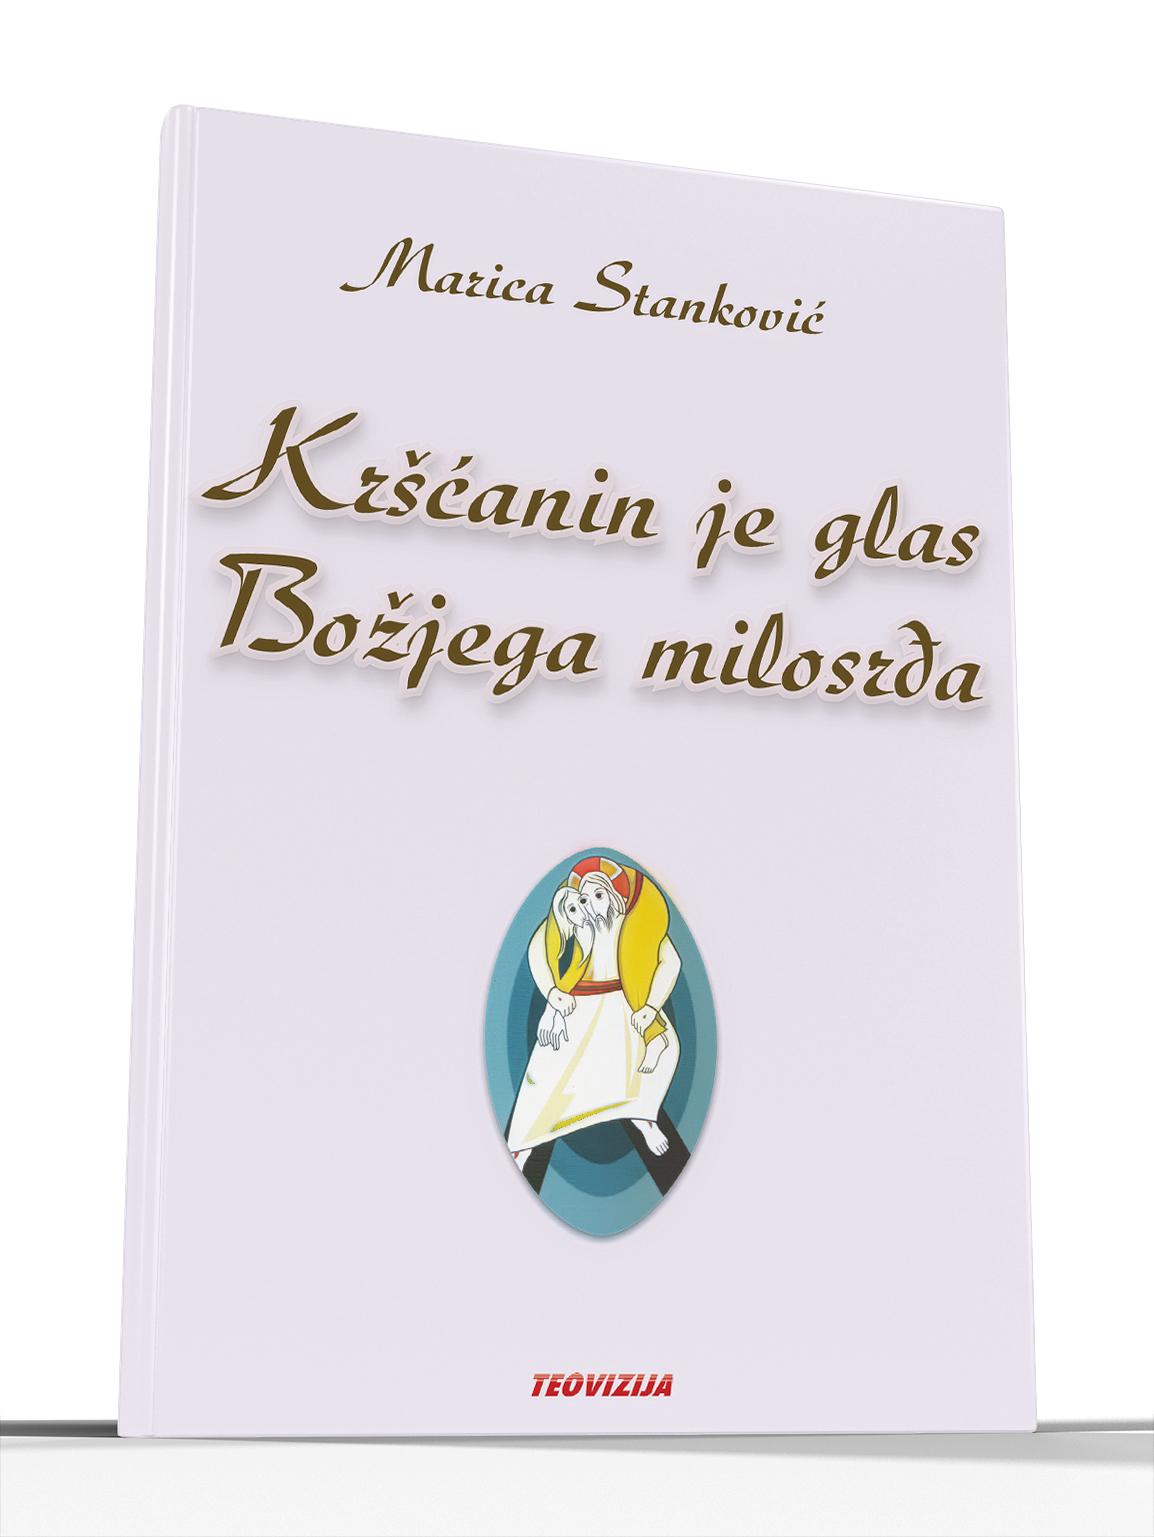 KRŠĆANIN JE GLAS BOŽJEG MILOSRĐA - Marica Stanković